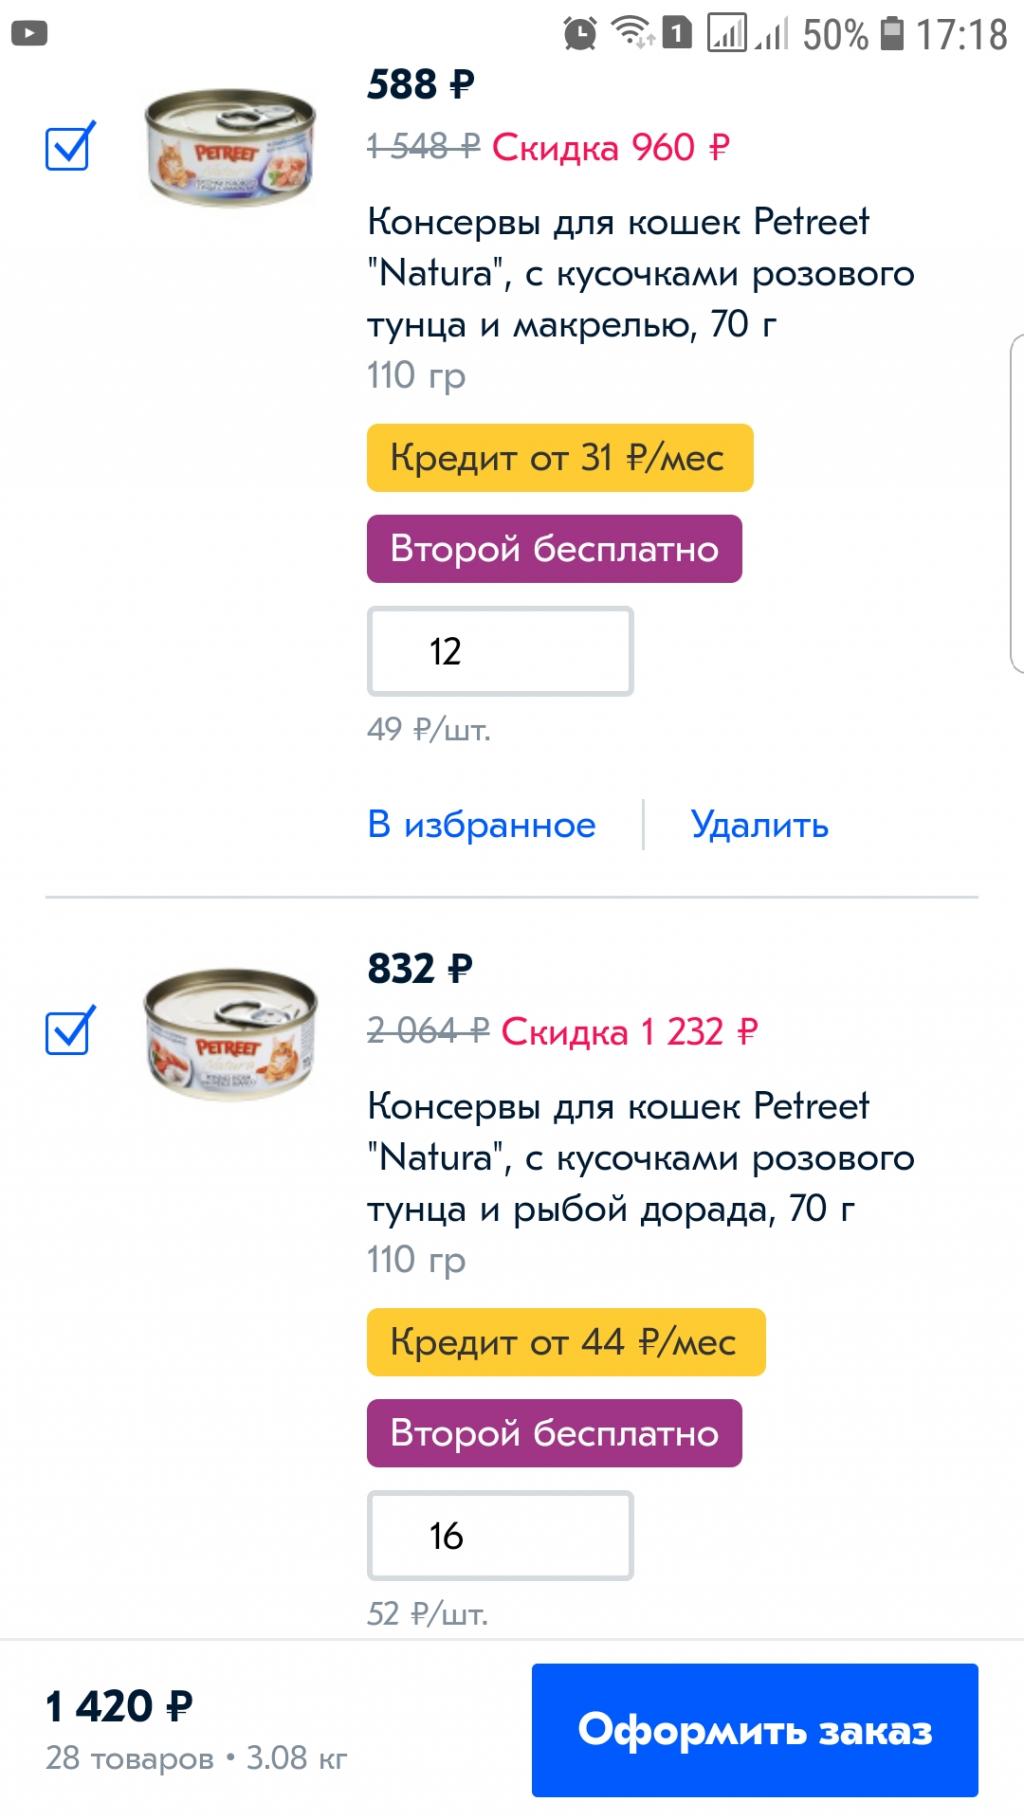 OZON.ru - Обман и надувательство